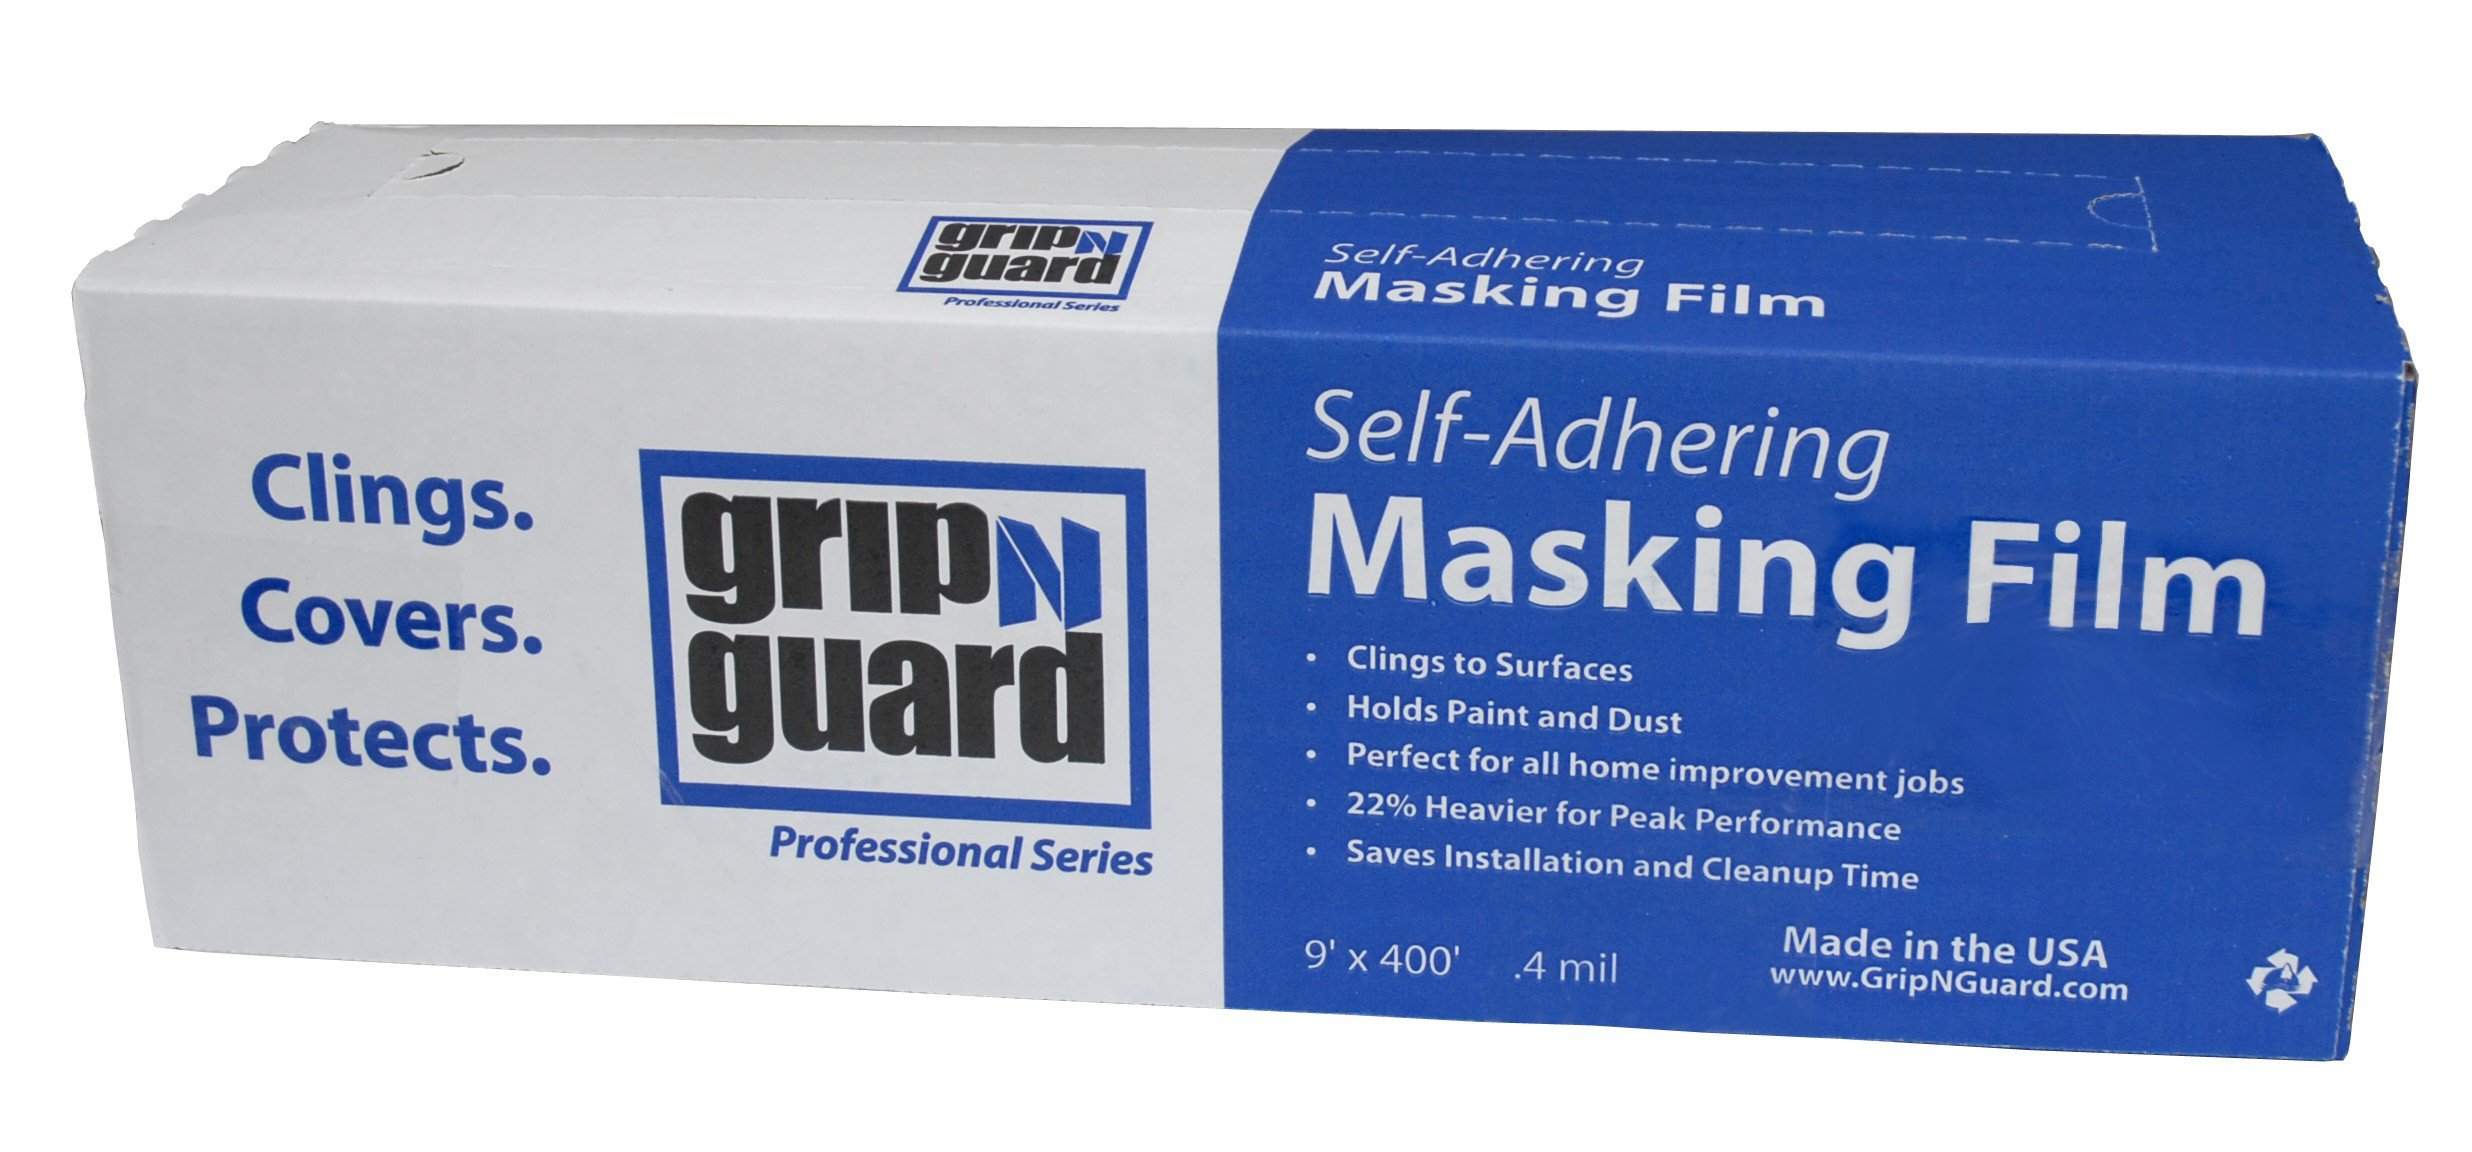 Grip-N-Guard FG-P9943-74 Self Adheing Masking Film 0.40ml, 9-Feet by 400-Feet